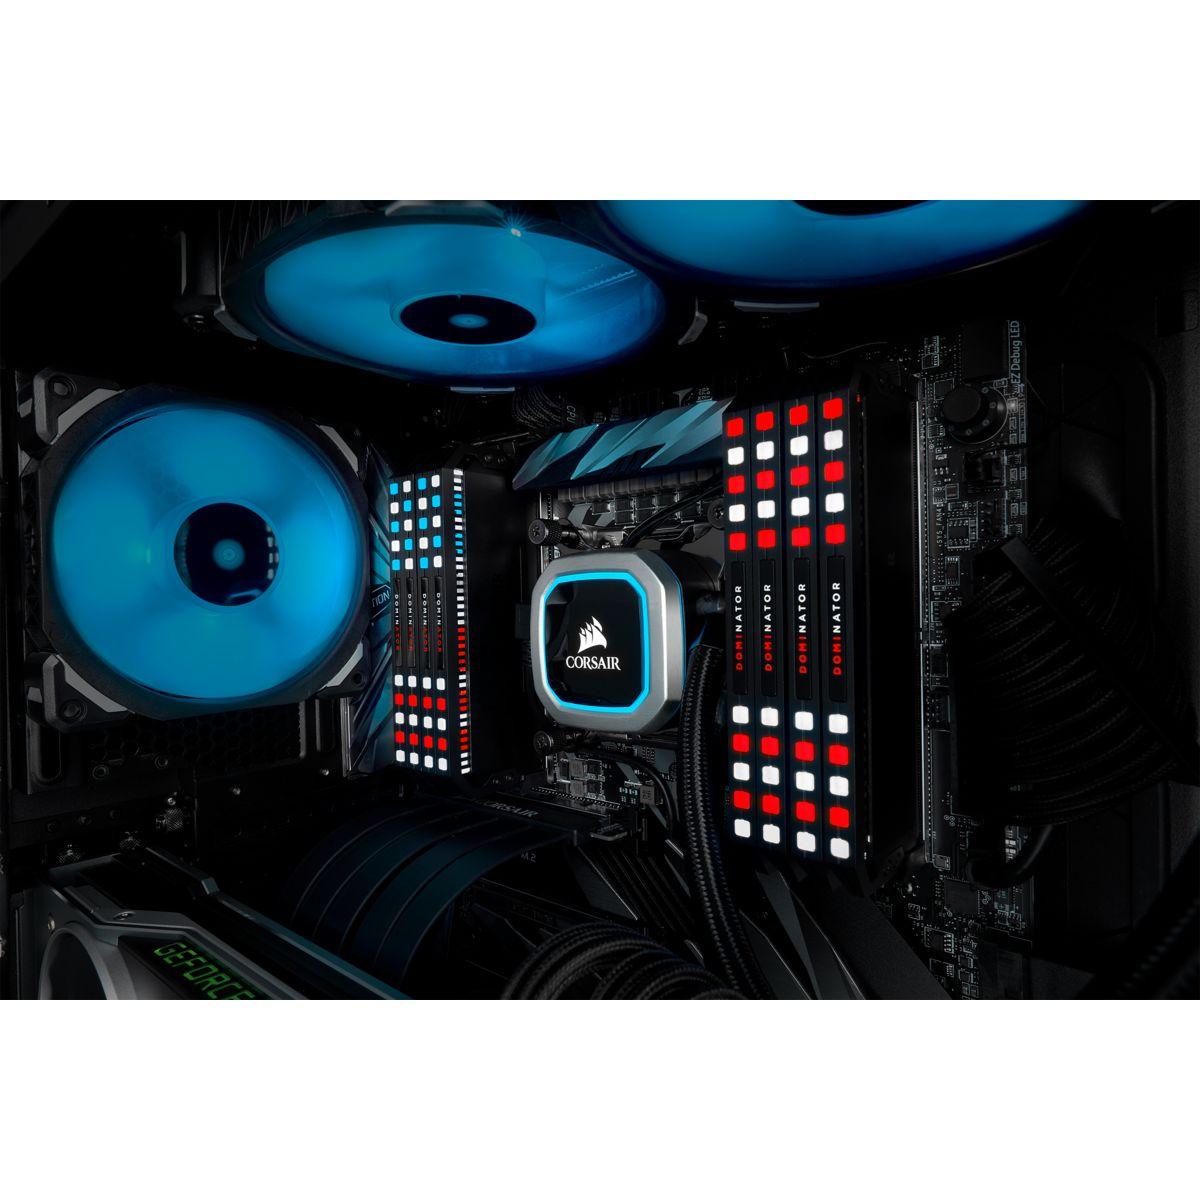 Kit de RAM Dominator Platinum RGB 16 Go (2 x 8 Go) DDR4-3600 Corsair